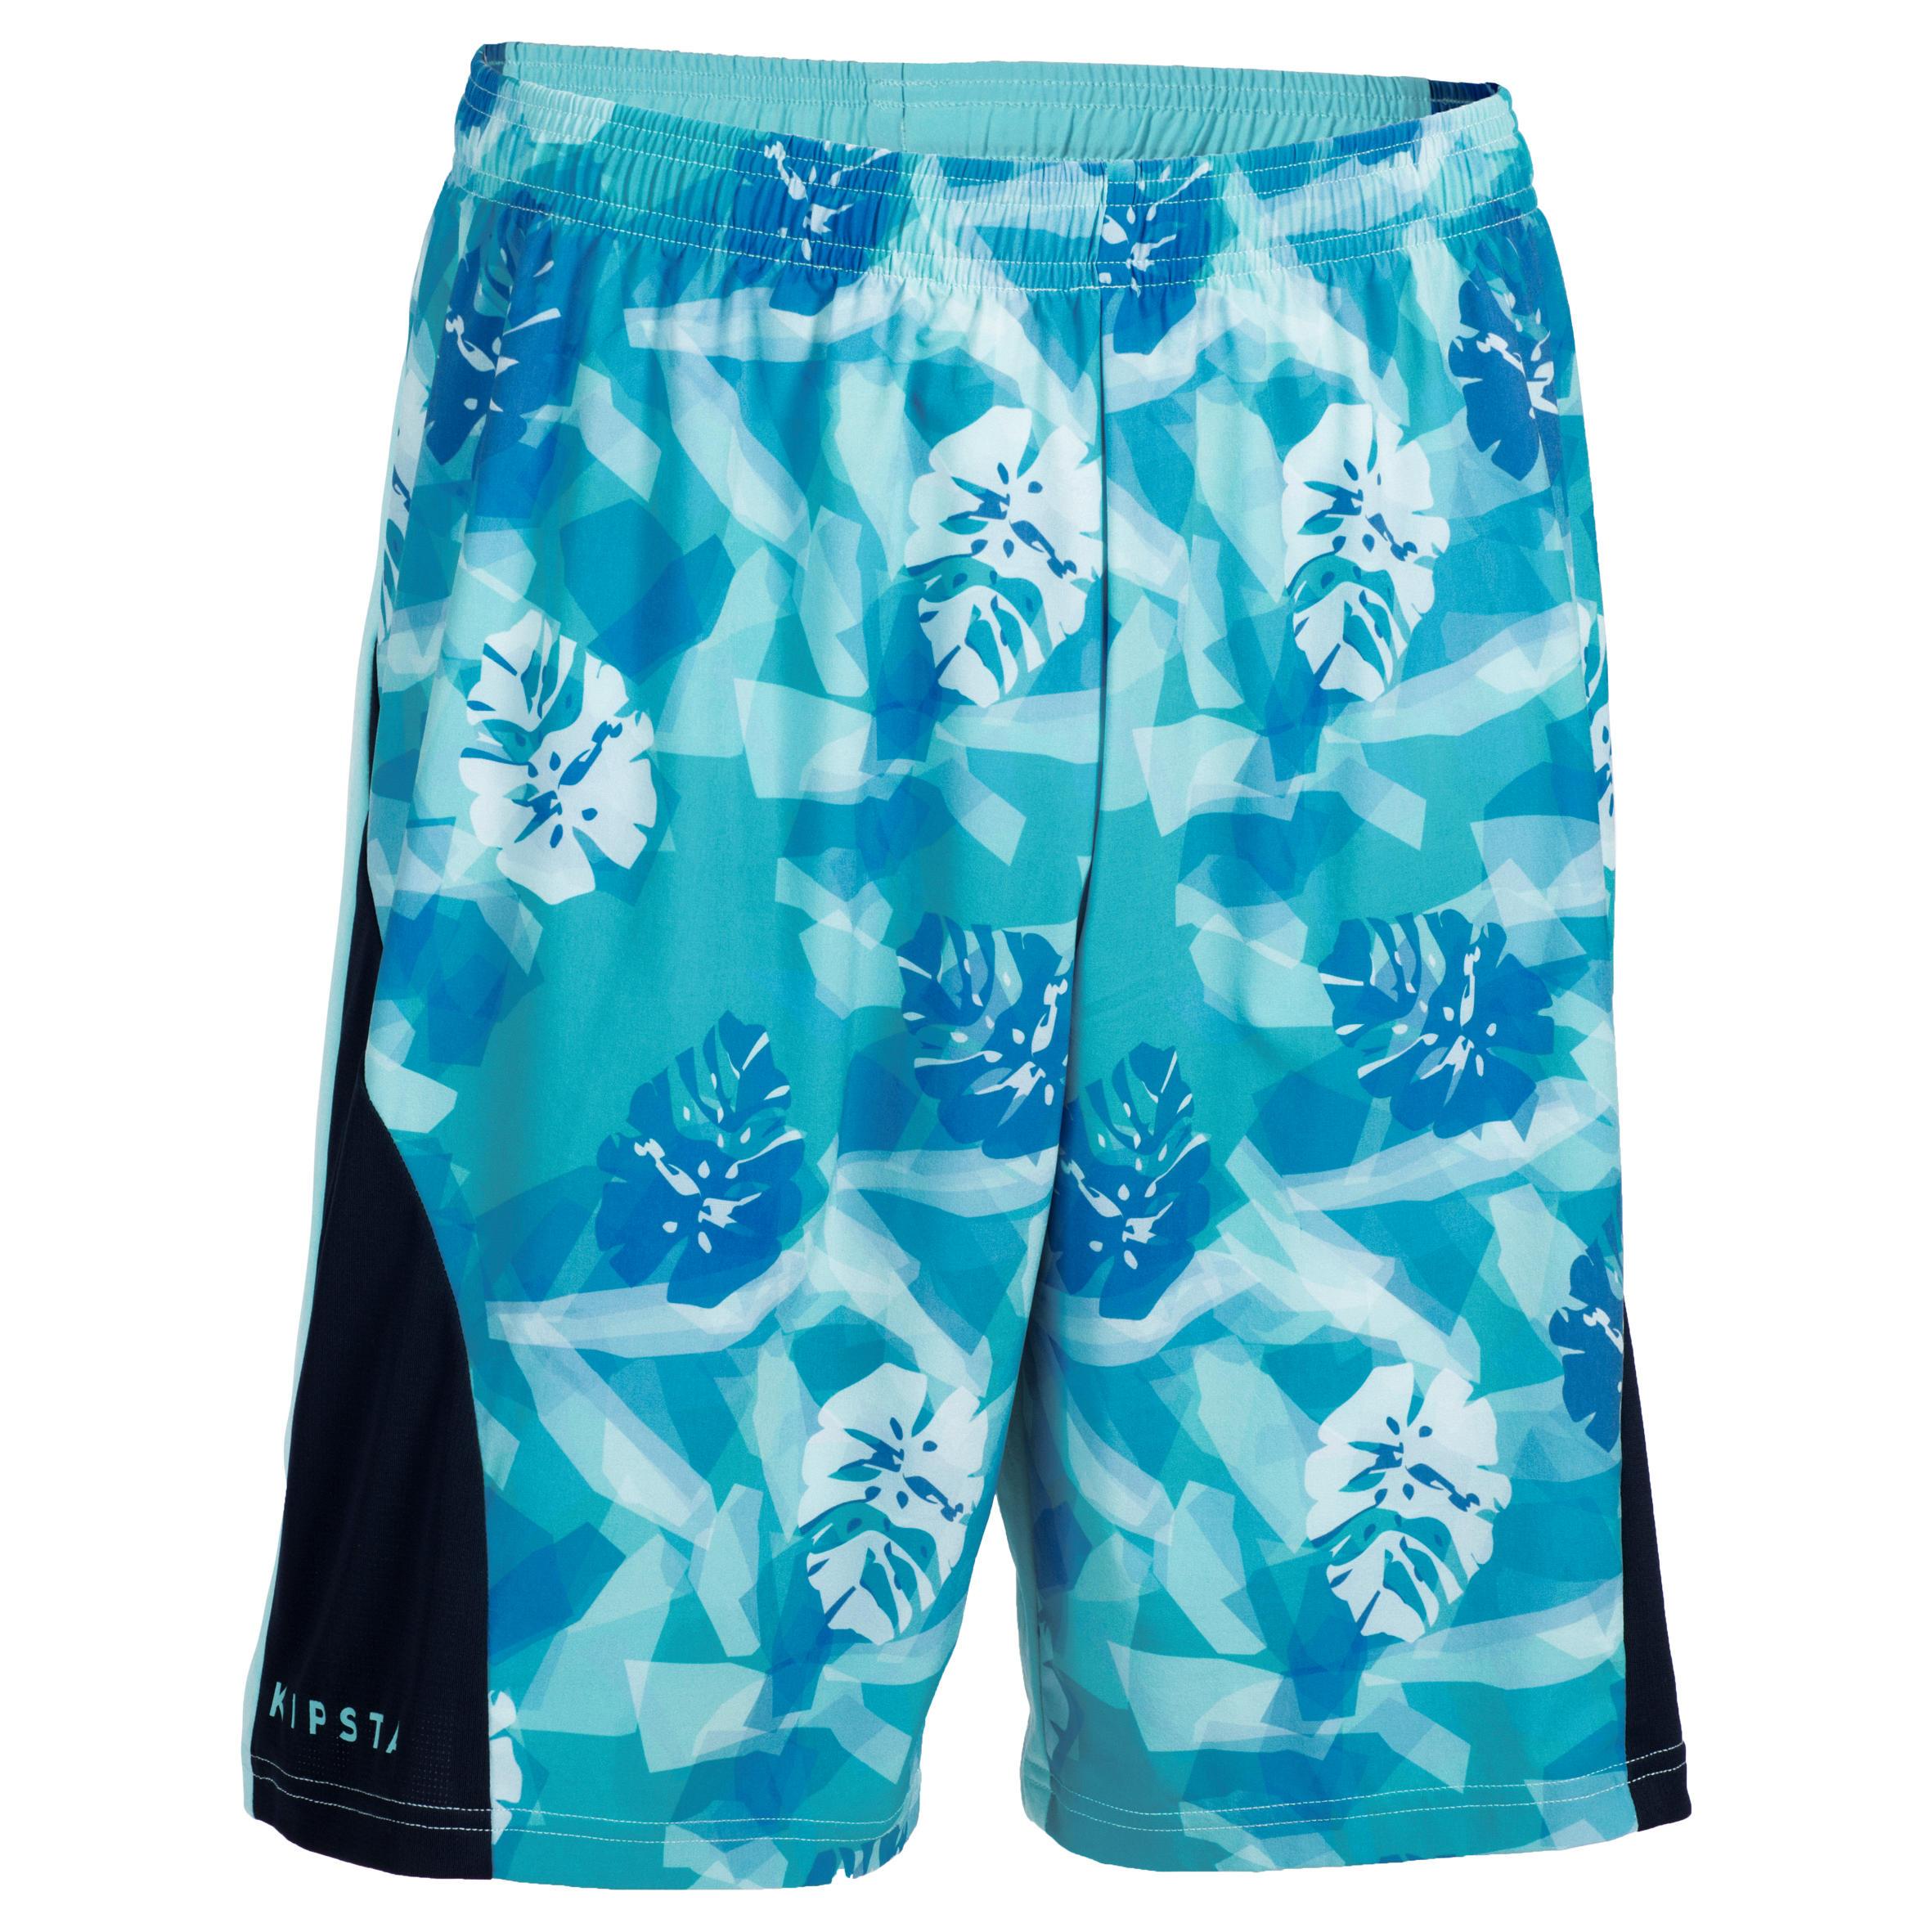 BV 500 Beach Volleyball Shorts - Navy